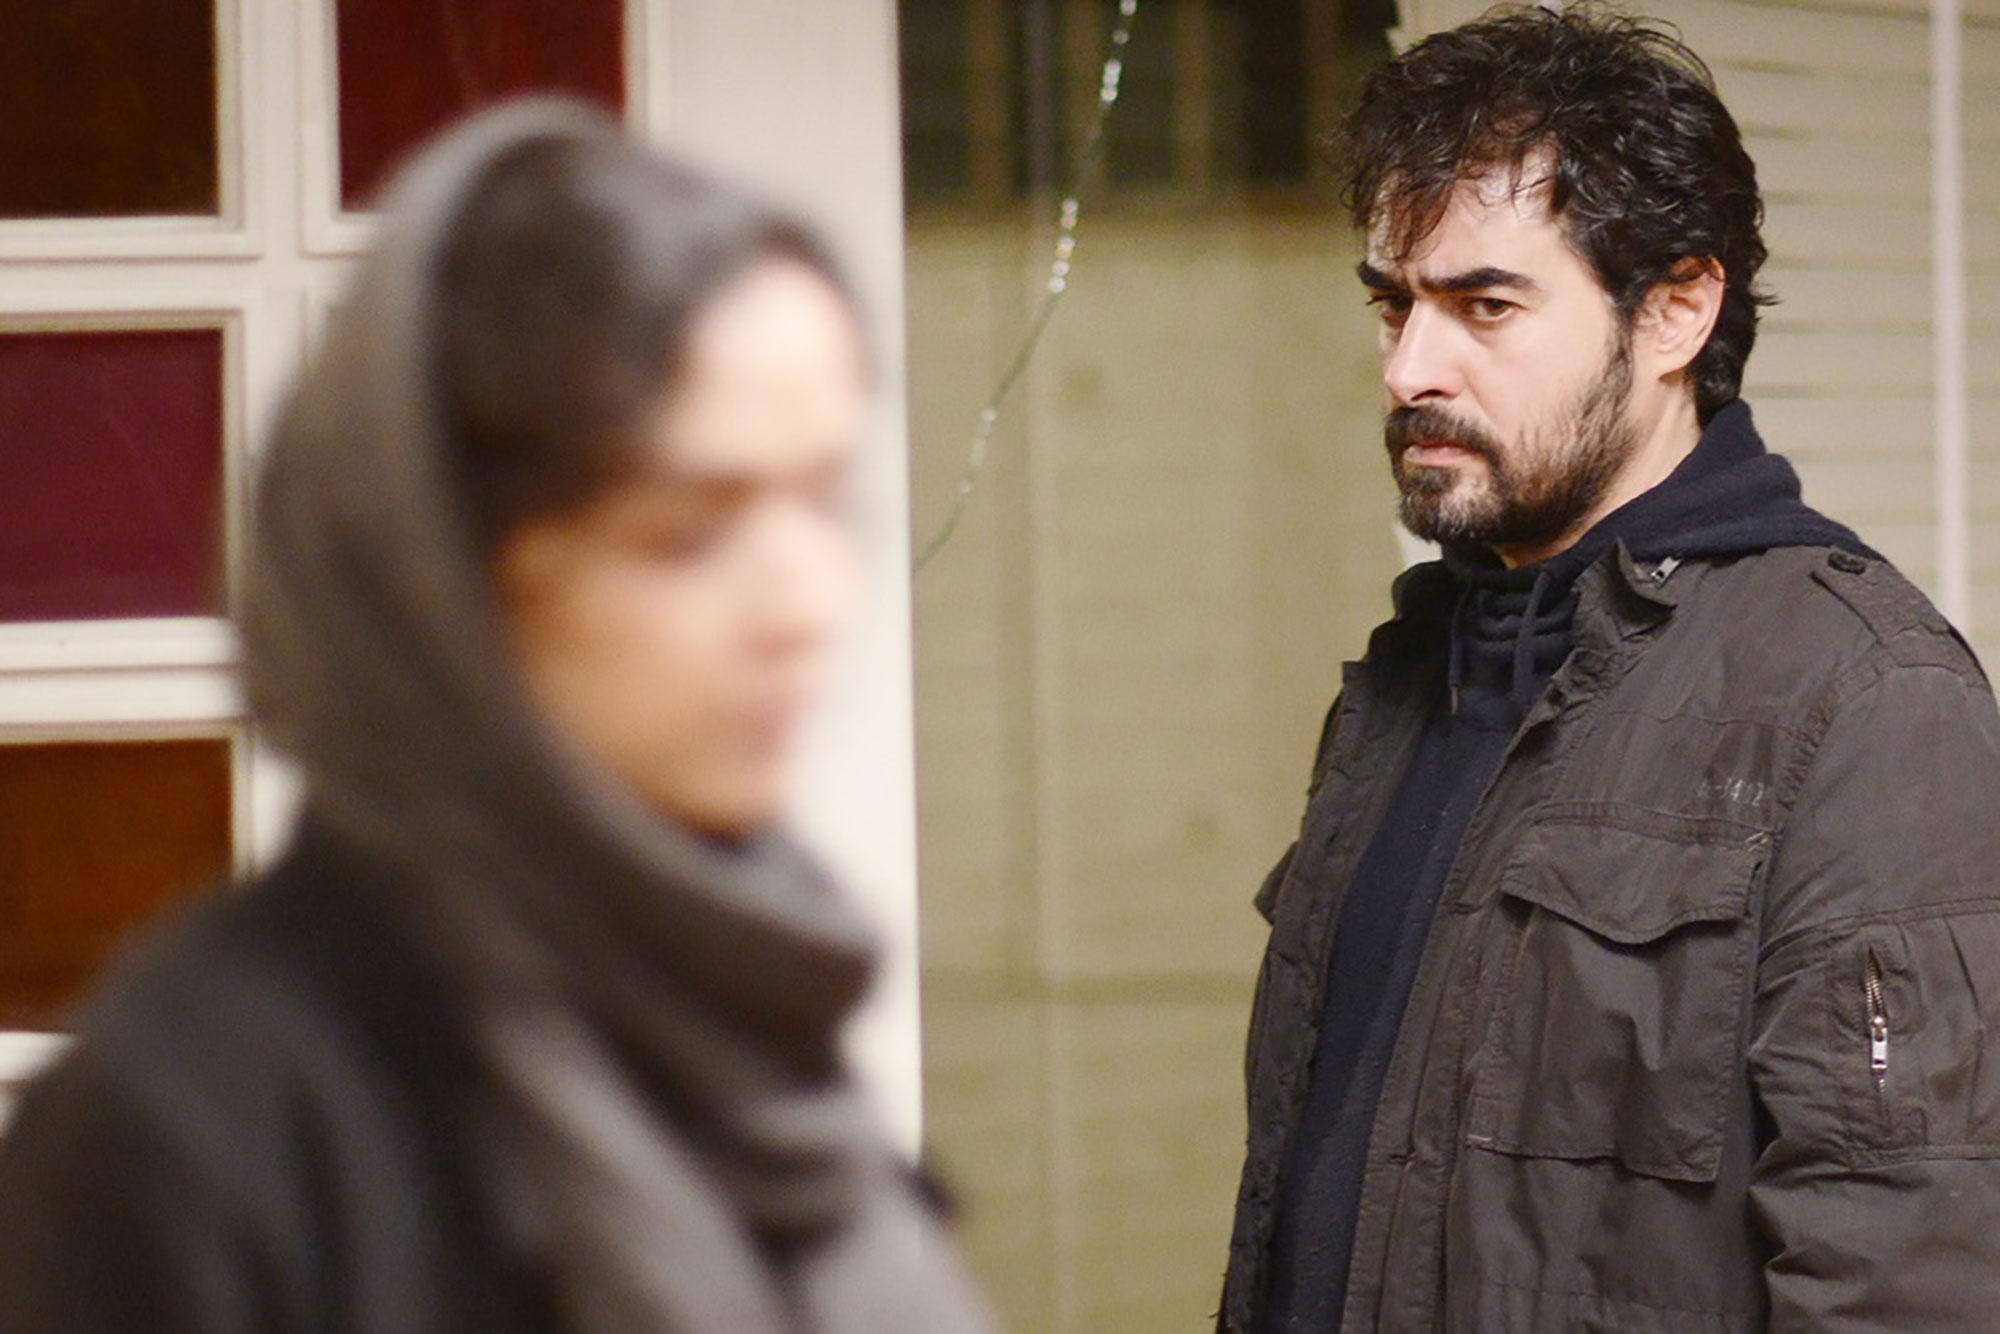 ©︎ MEMENTOFILMS PRODUCTION–ASGHAR FARHADI PRODUCTION–ARTE FRANCE CINEMA 2016